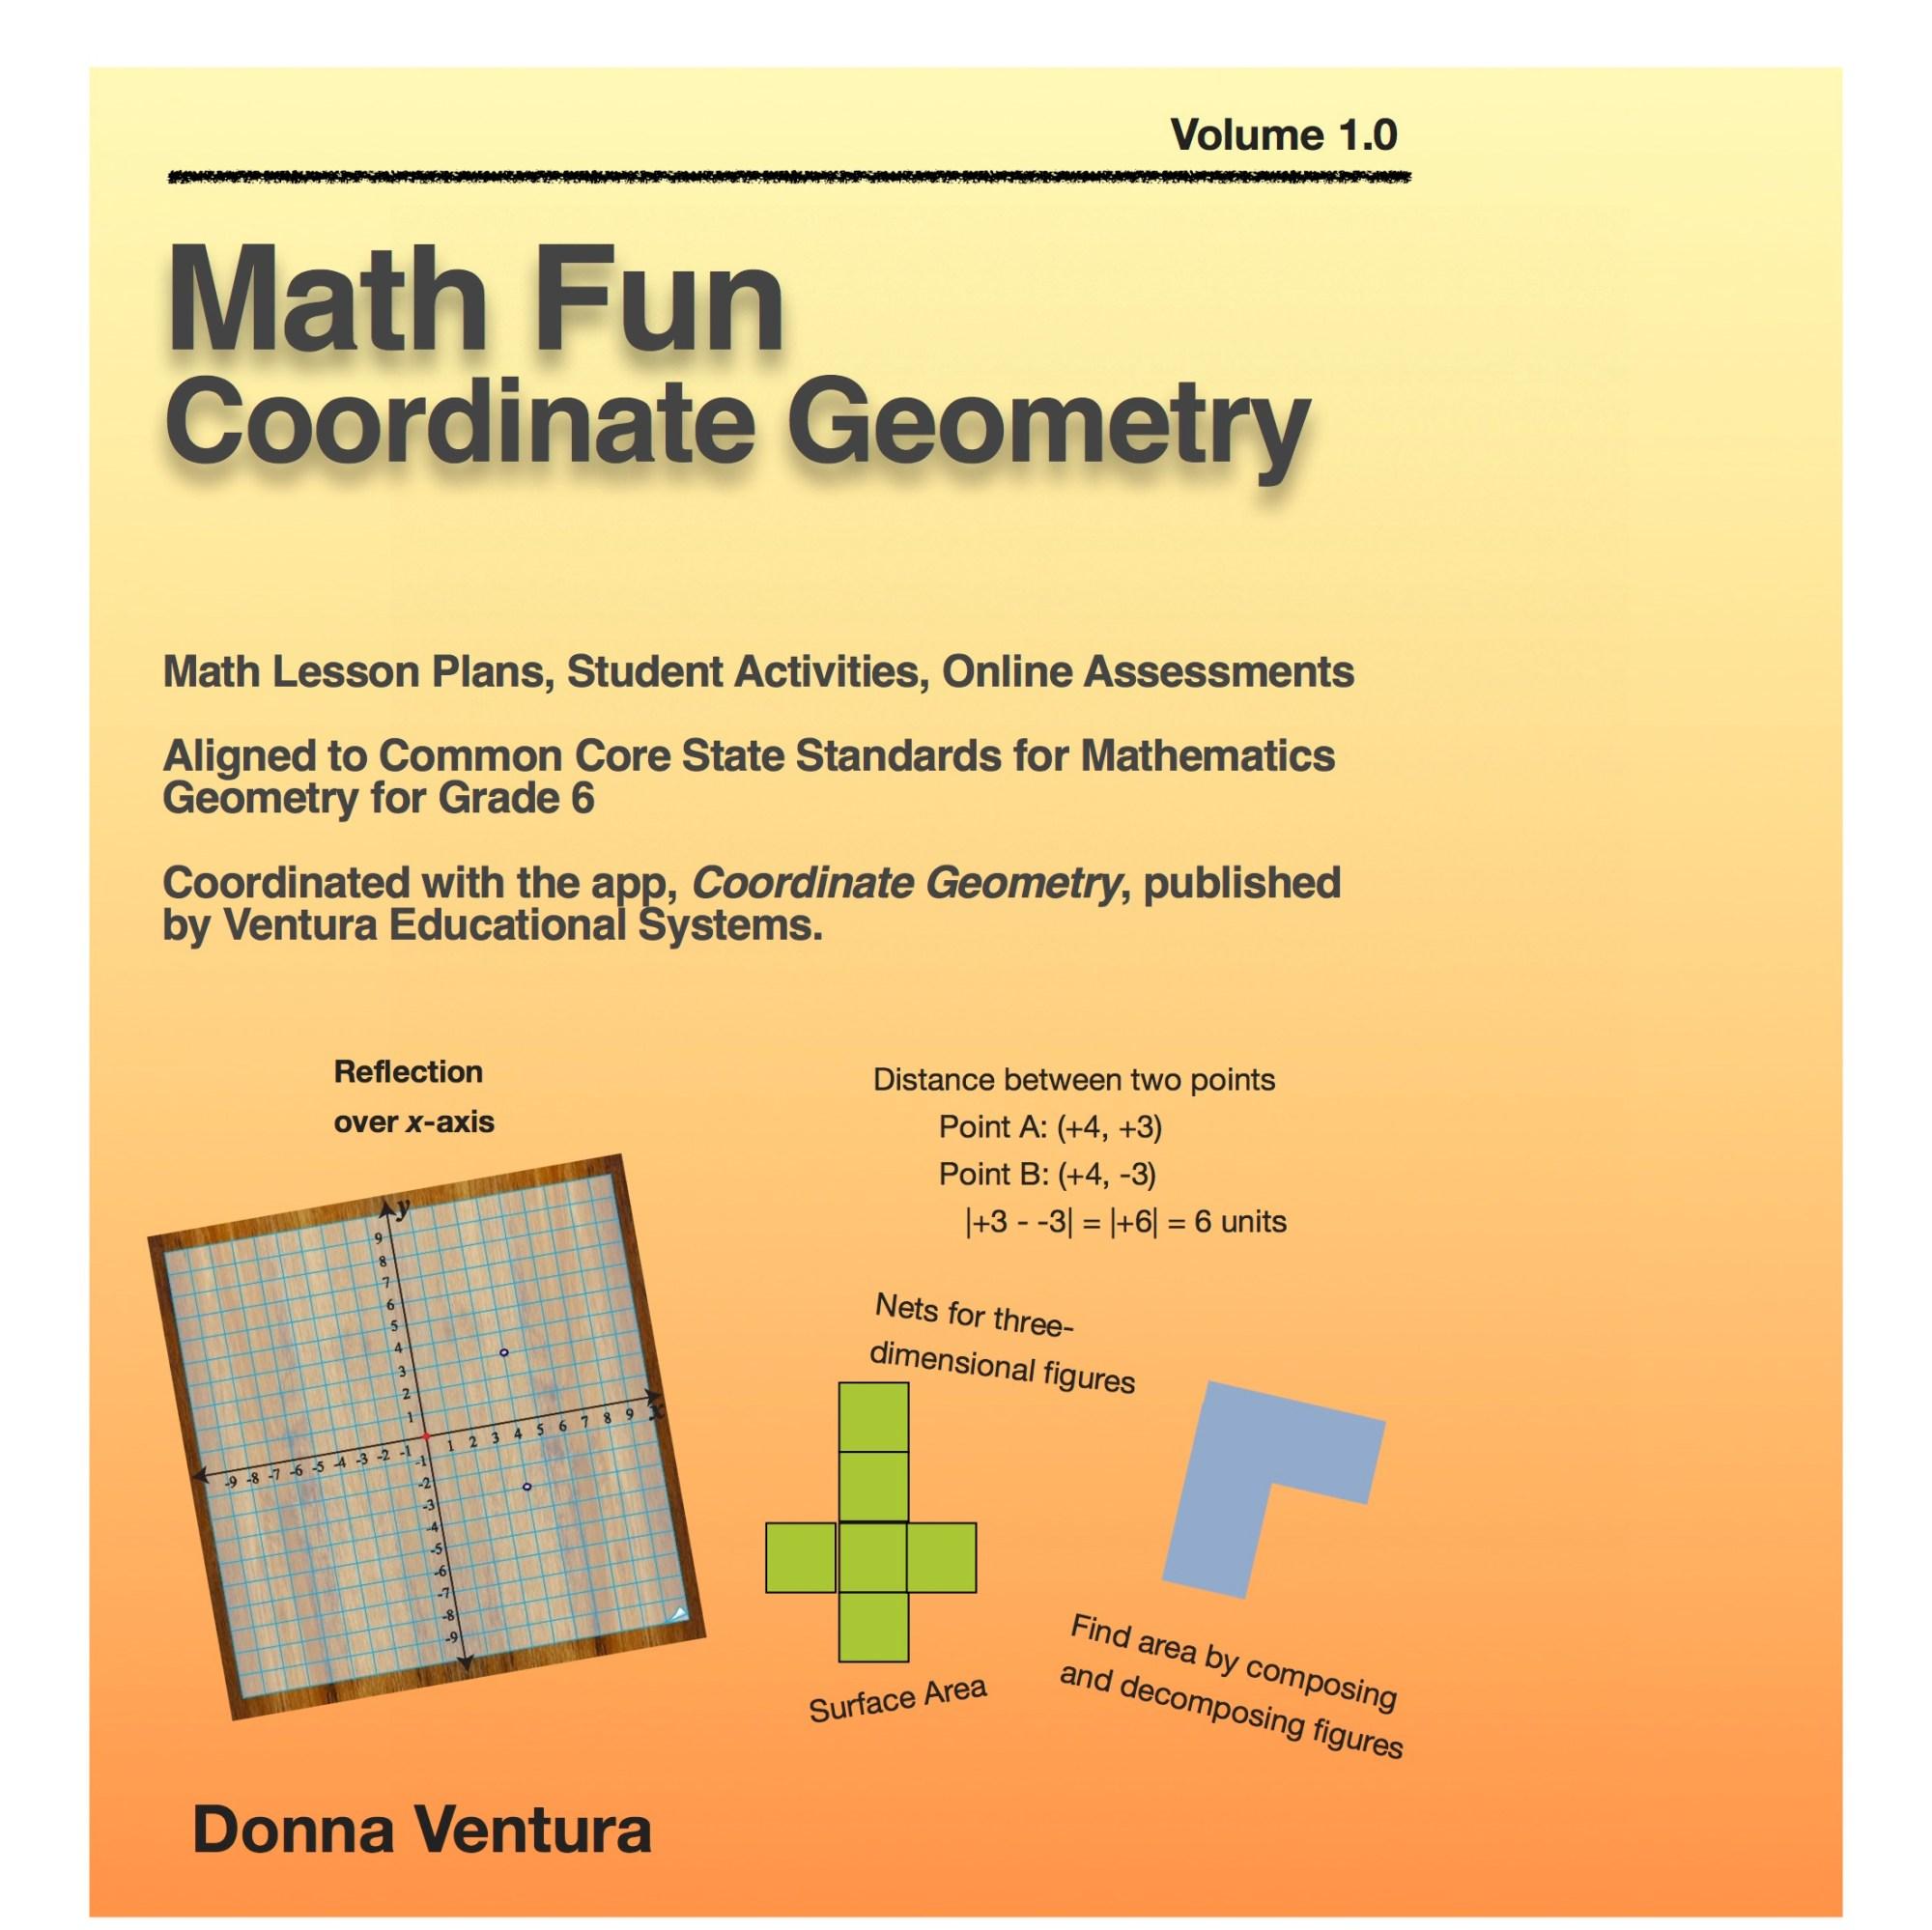 hight resolution of Math Fun Coordinate Geometry: Interactive Books    mathematicsinteractivebooks